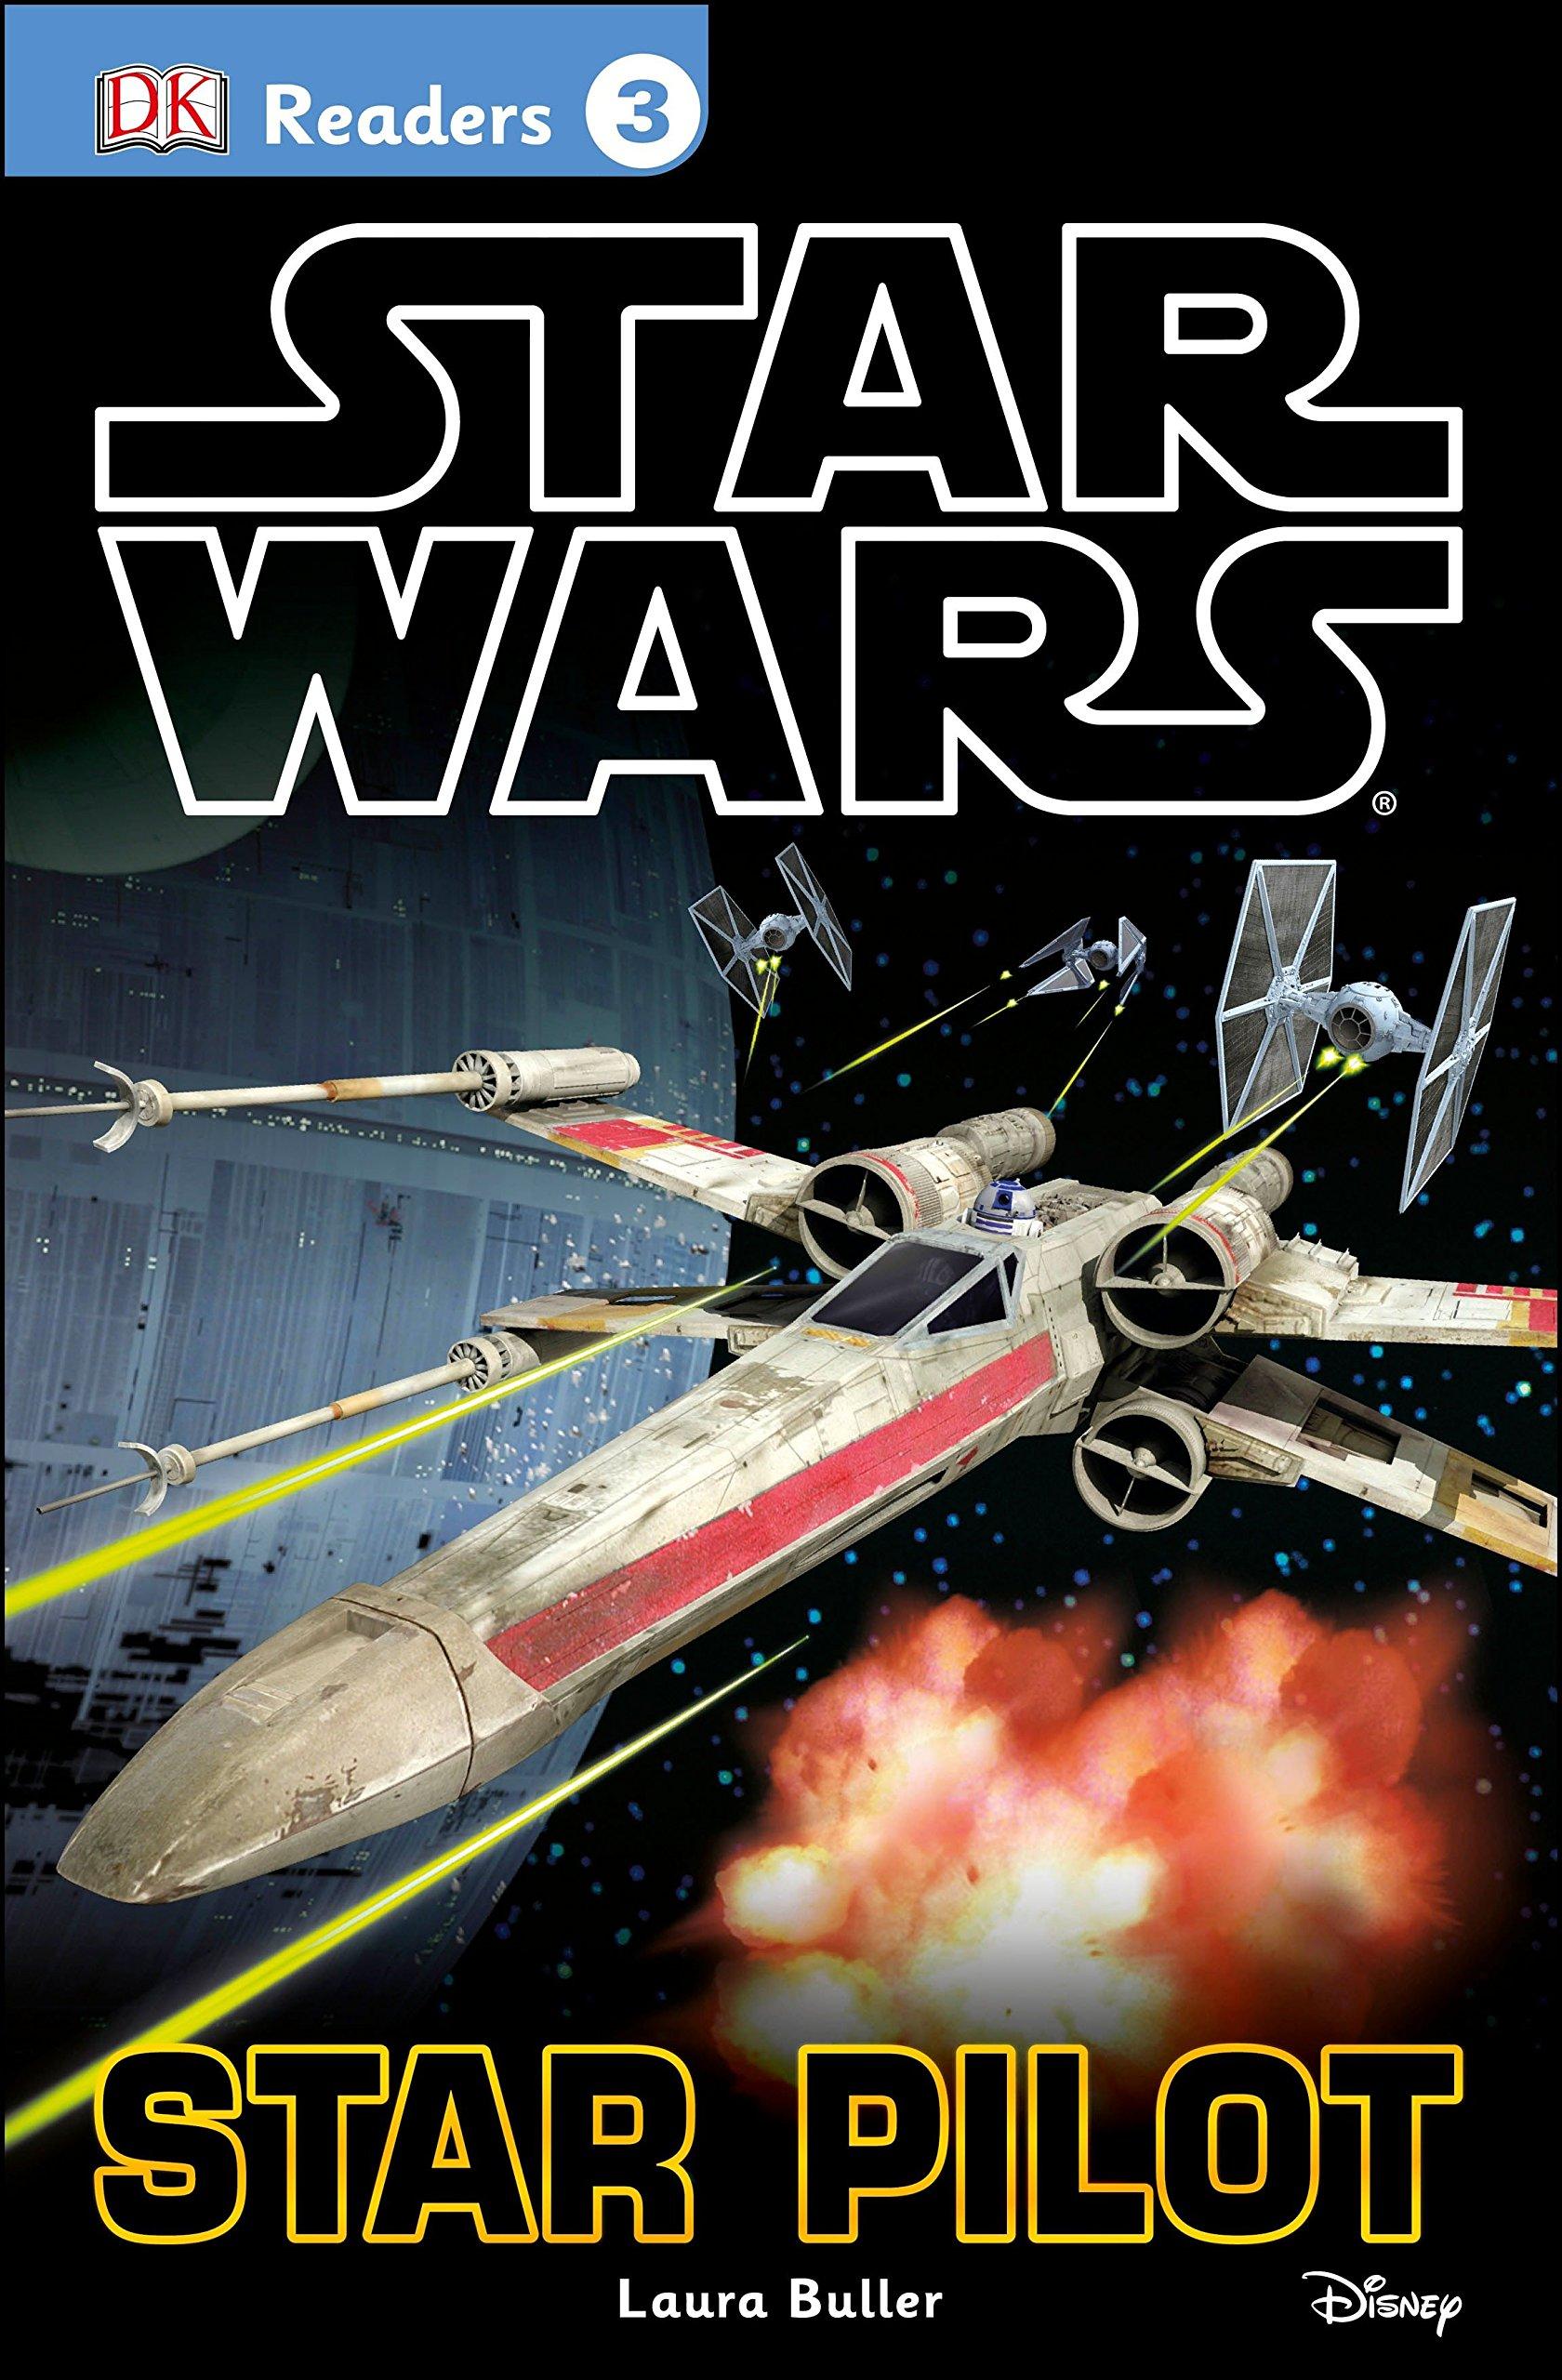 Star Wars: Star Pilot (reprint)